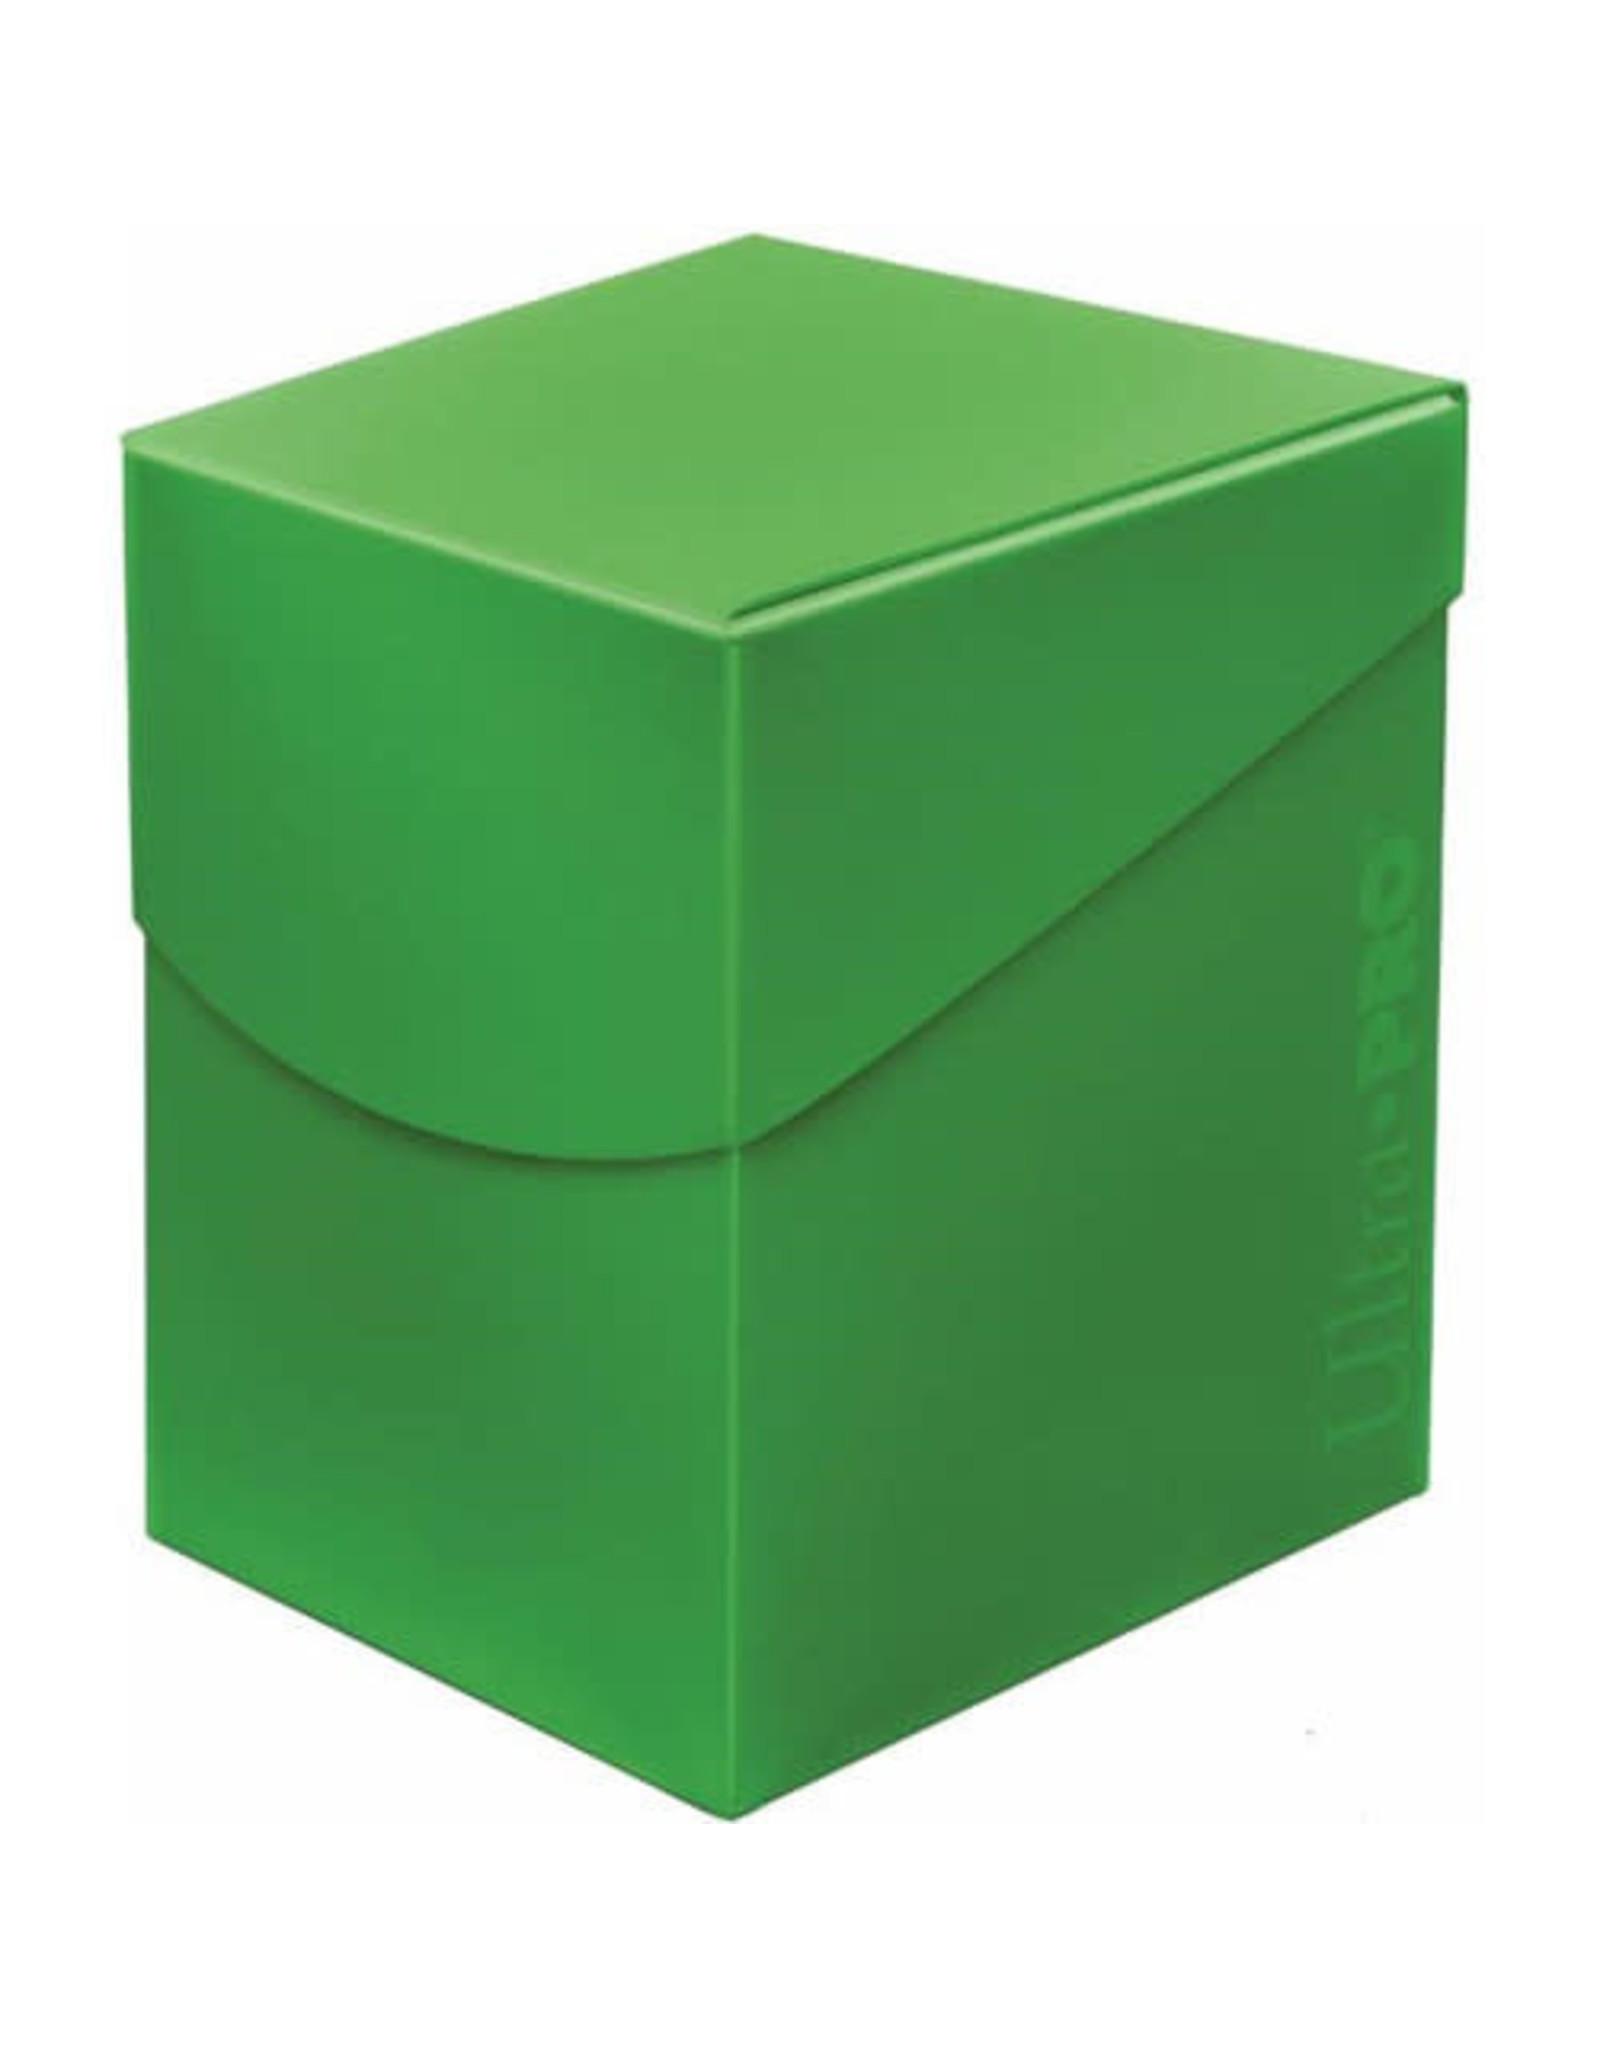 Ultra Pro Pro 100+ Eclipse Deck Box Lime Green